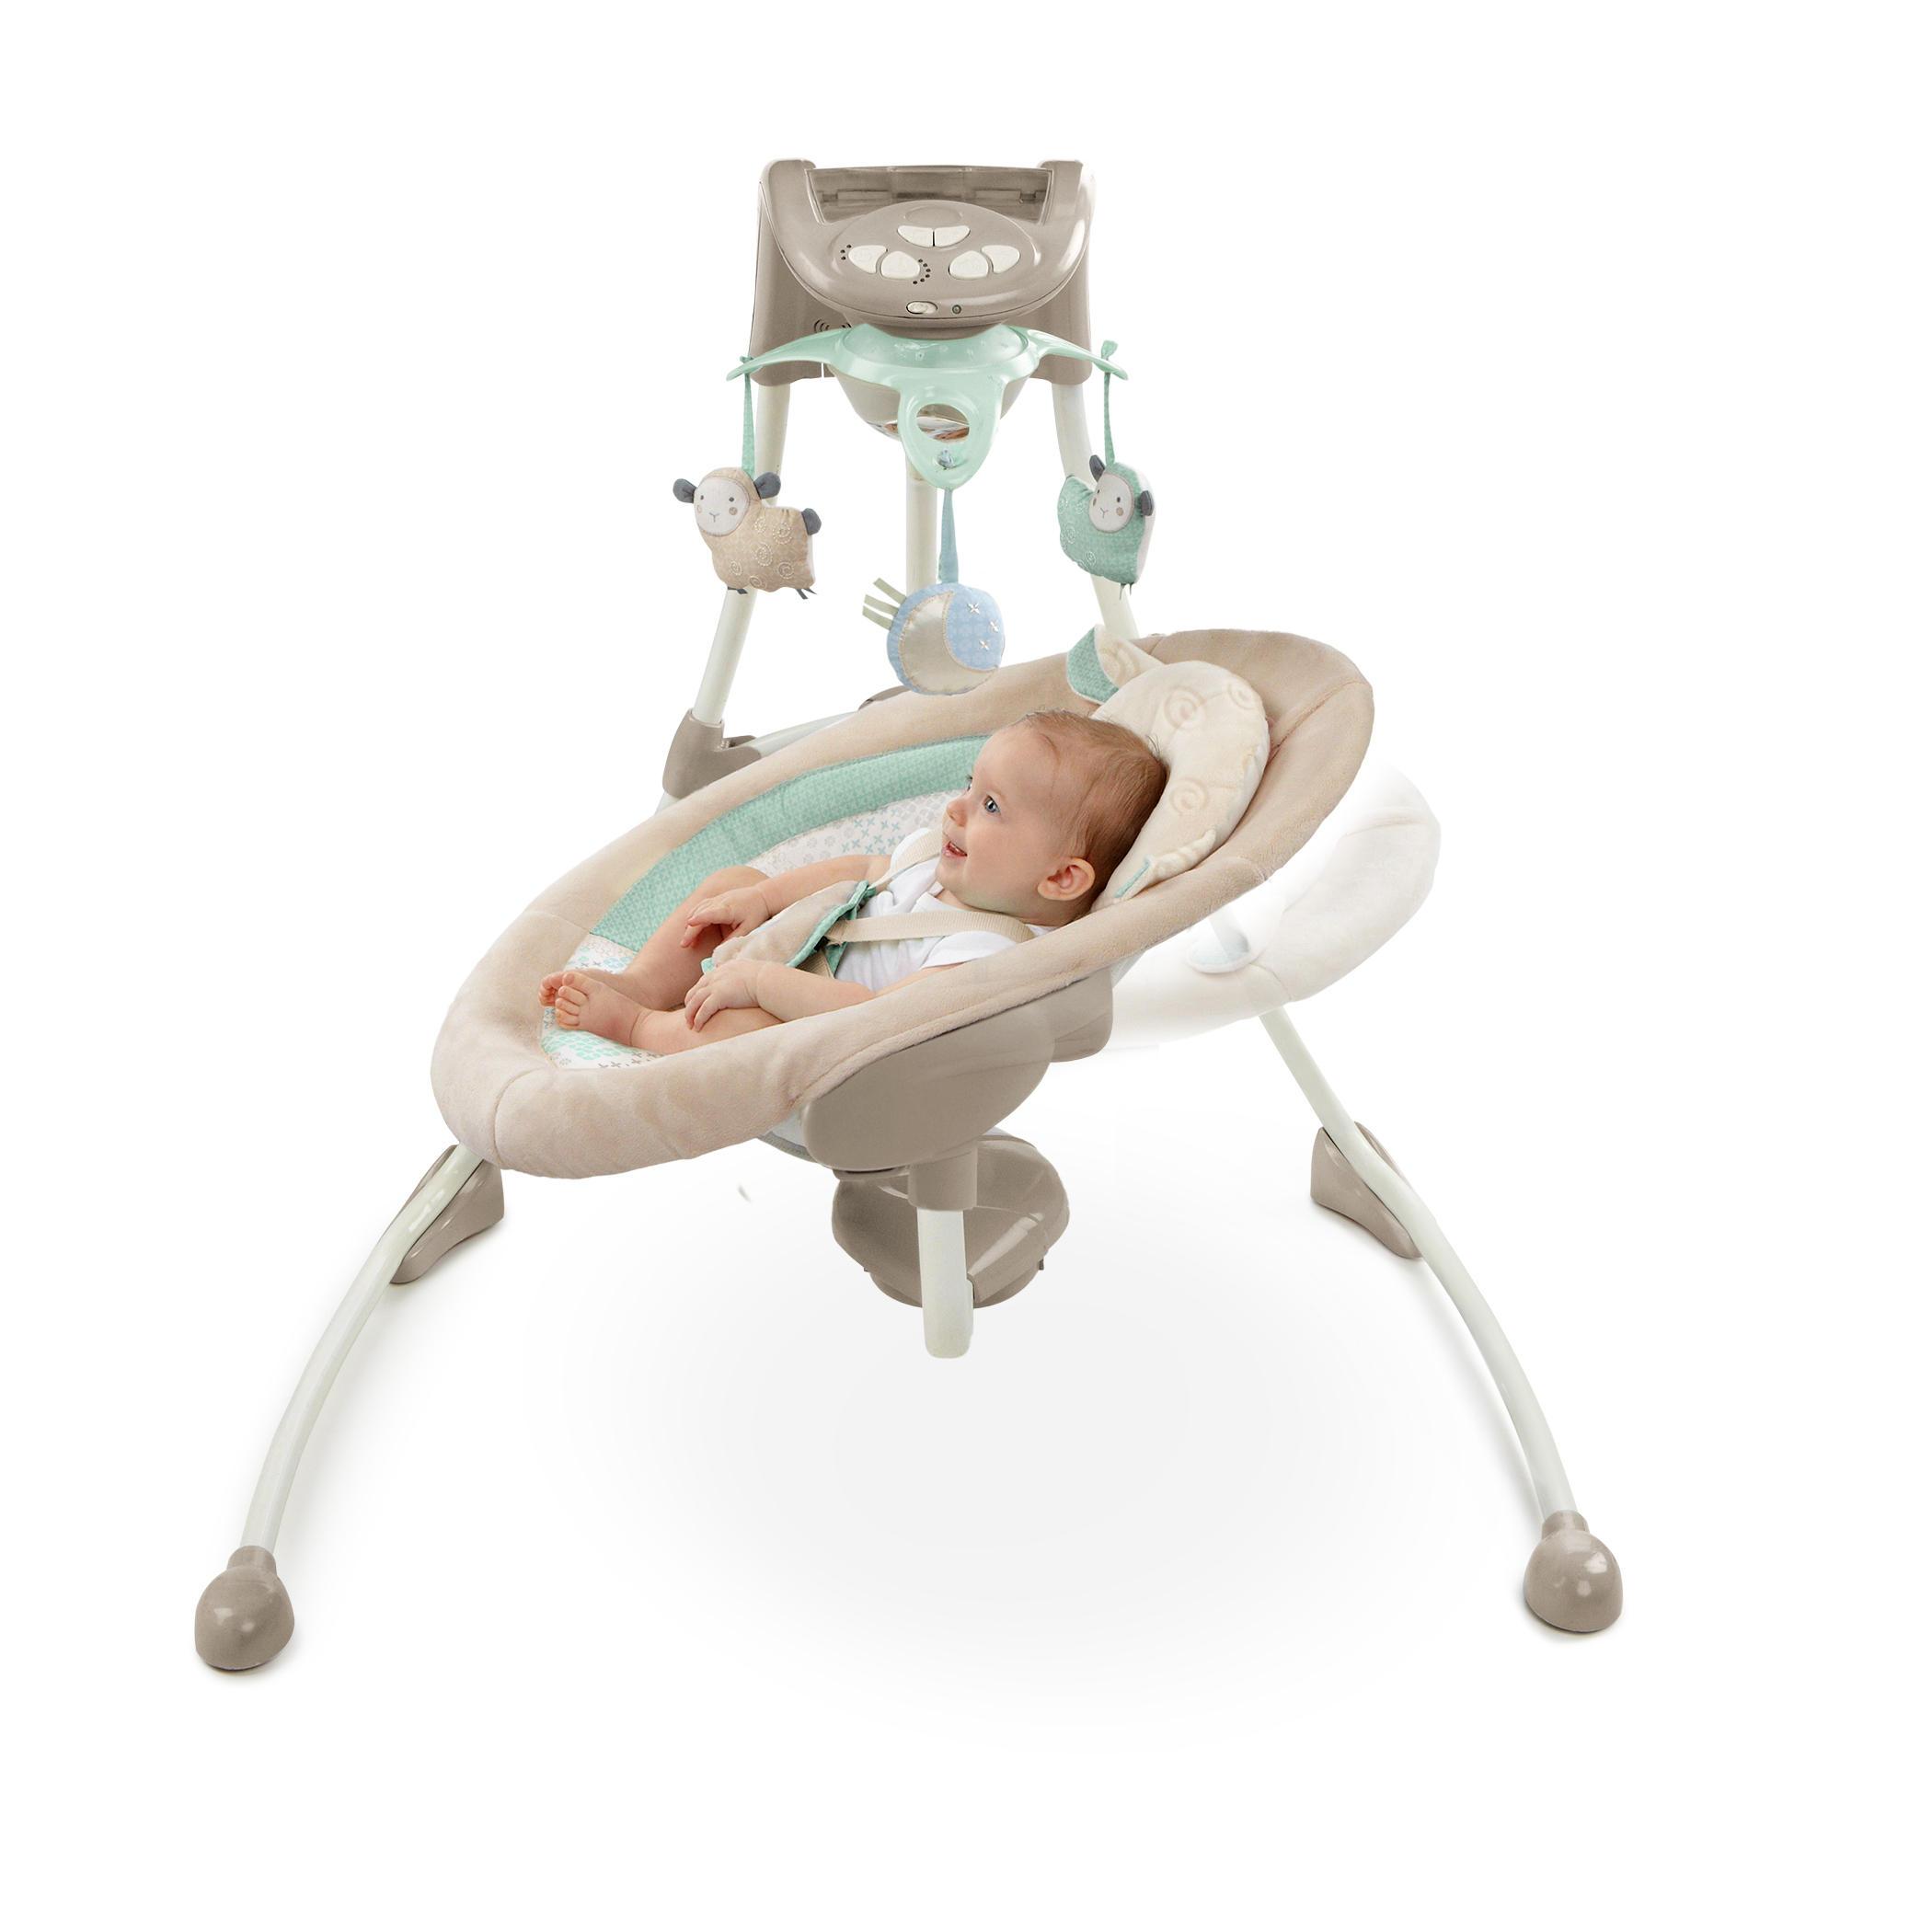 InLighten Cradling Swing™ - Lullaby Lamb™